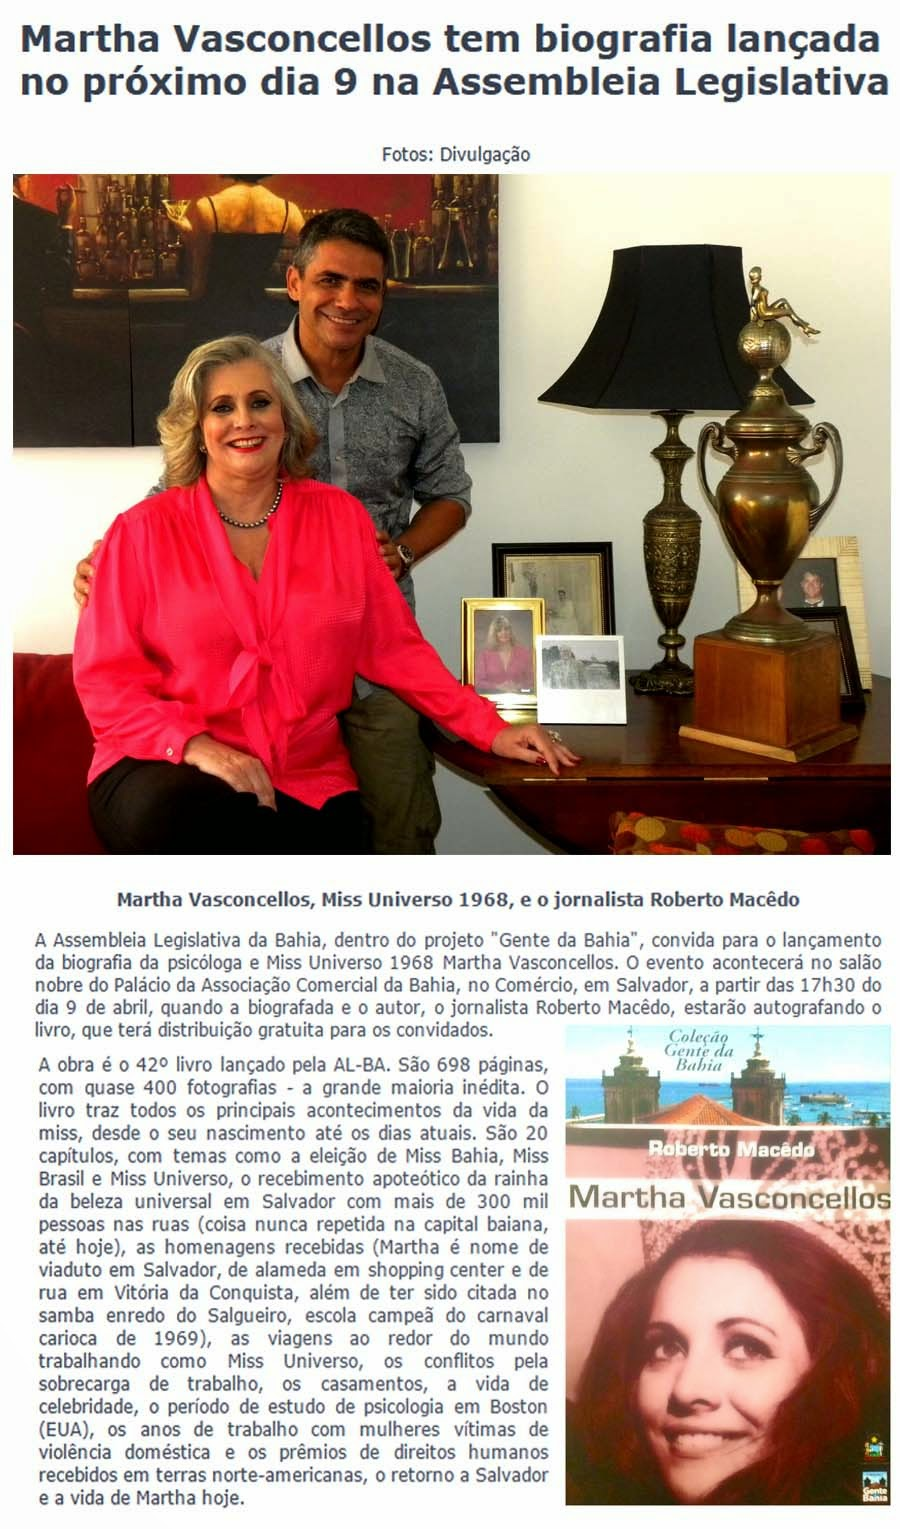 ☽ ✮ ✯ ✰ ☆ ☁ Galeria de Martha Vasconcelos, Miss Universe 1968.☽ ✮ ✯ ✰ ☆ ☁ Livro%2Bde%2BMartha%2BVasconcellos